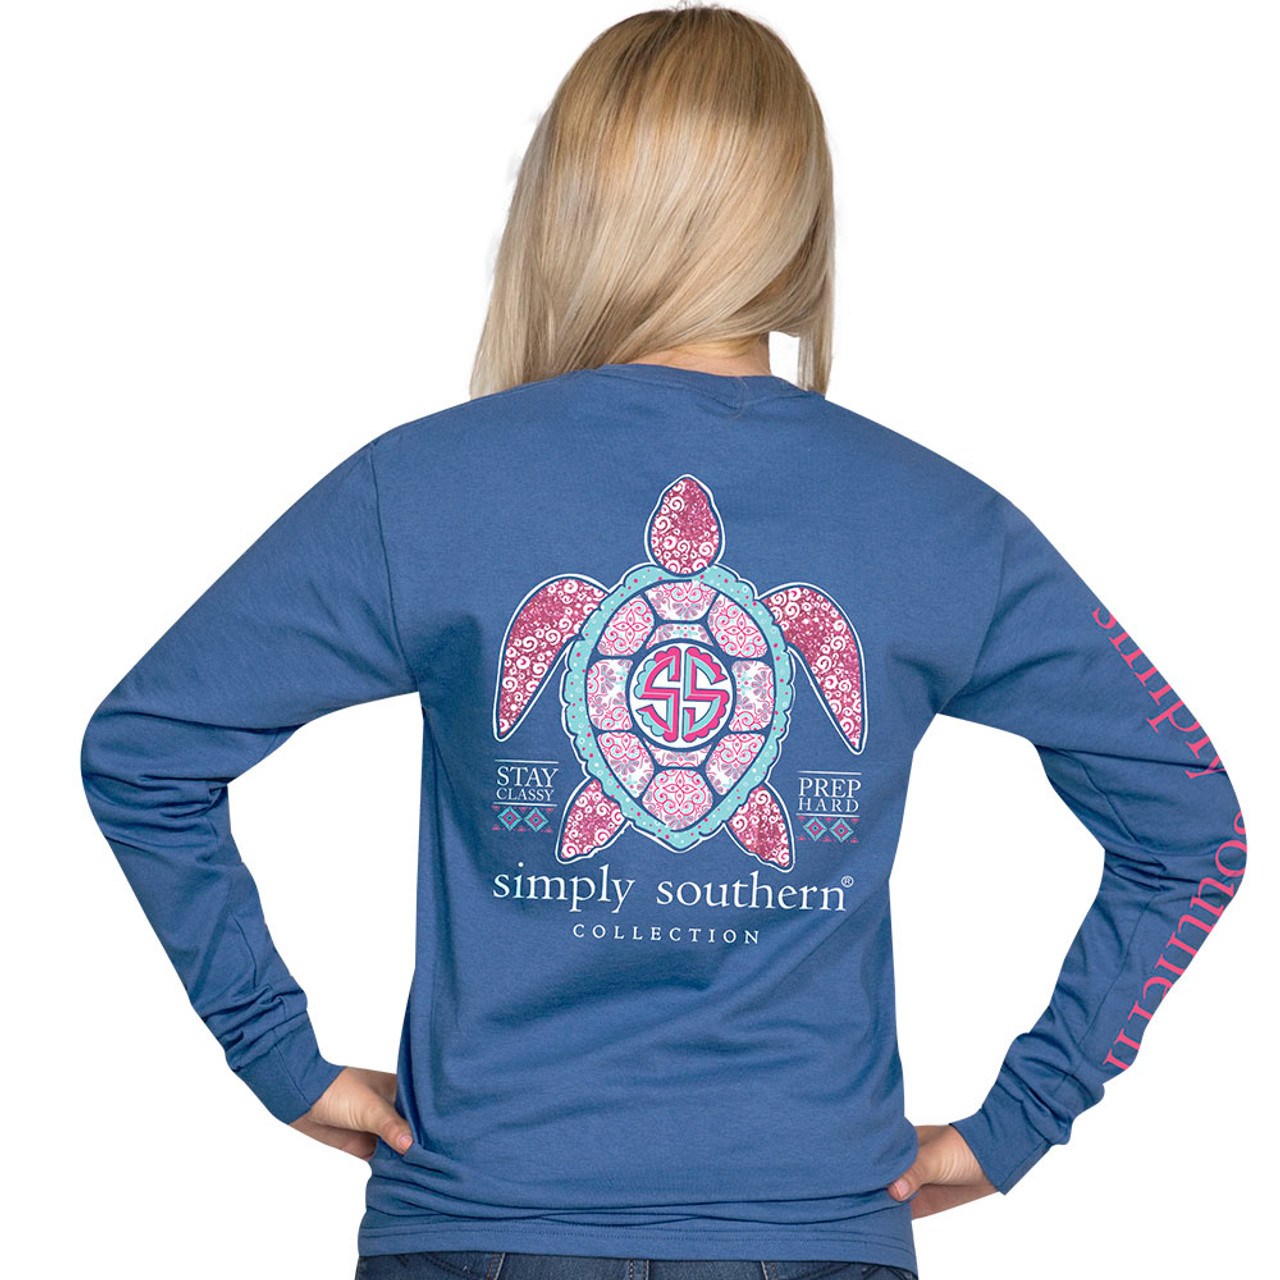 028970de Simply Southern LS Tee - Princess Turtle - Cordial Lee